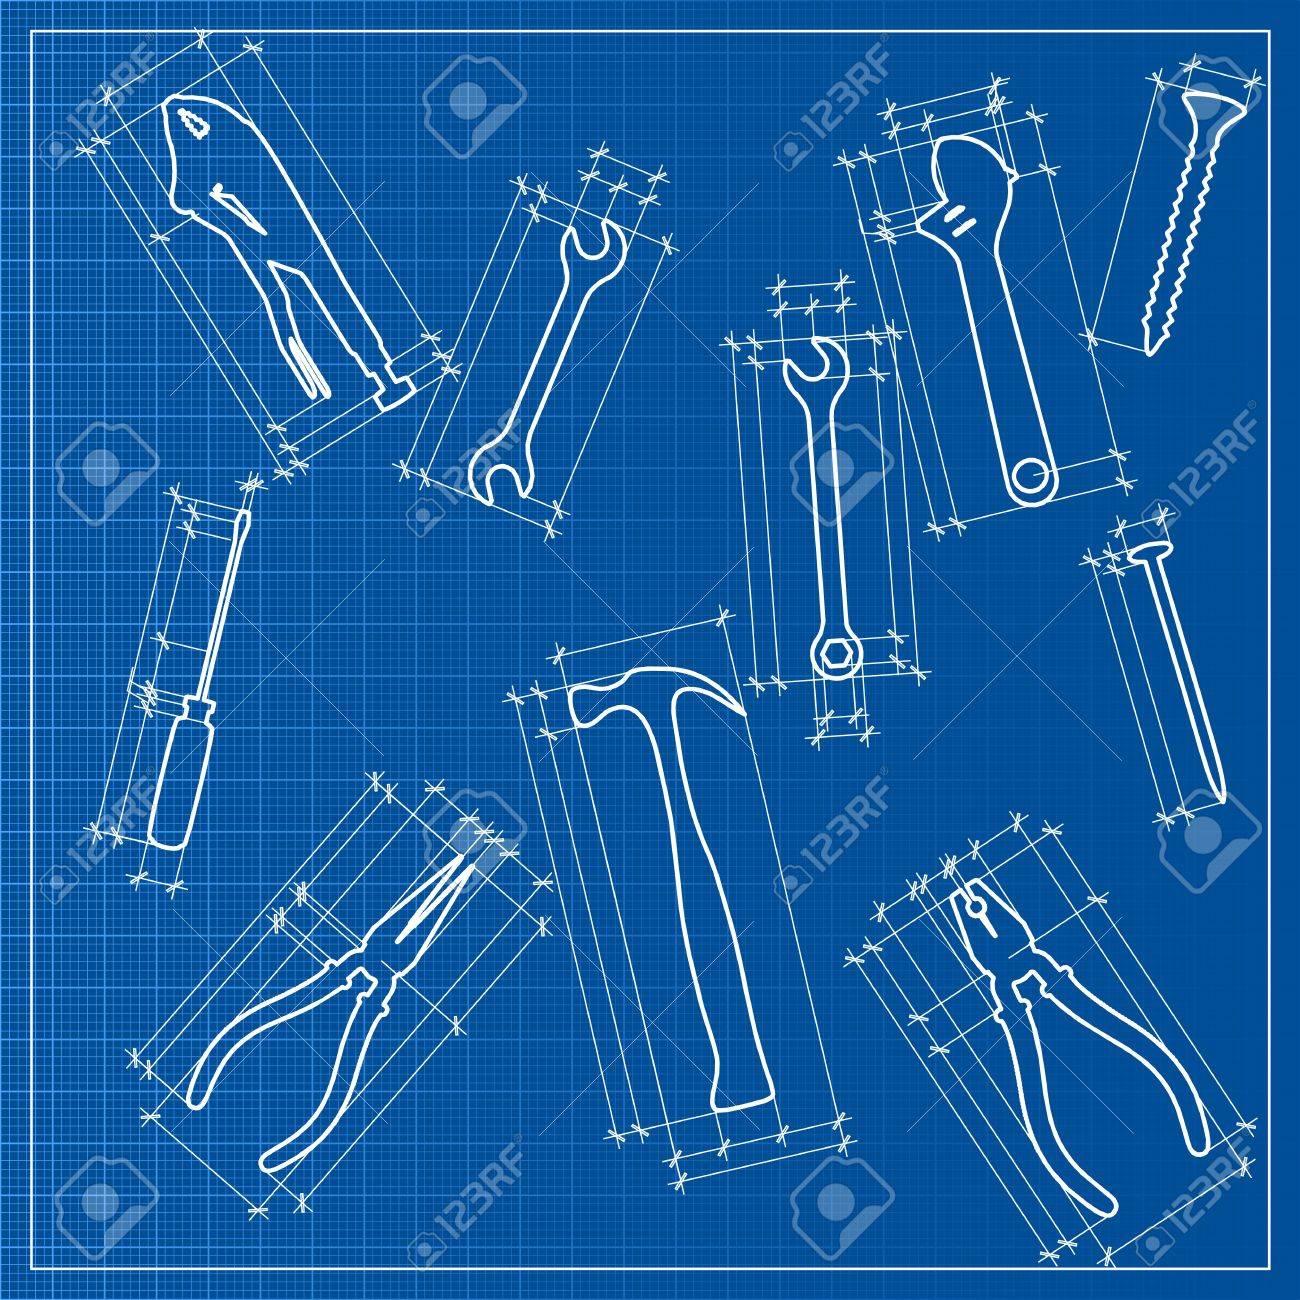 tools blueprint sketch Stock Vector - 21035275